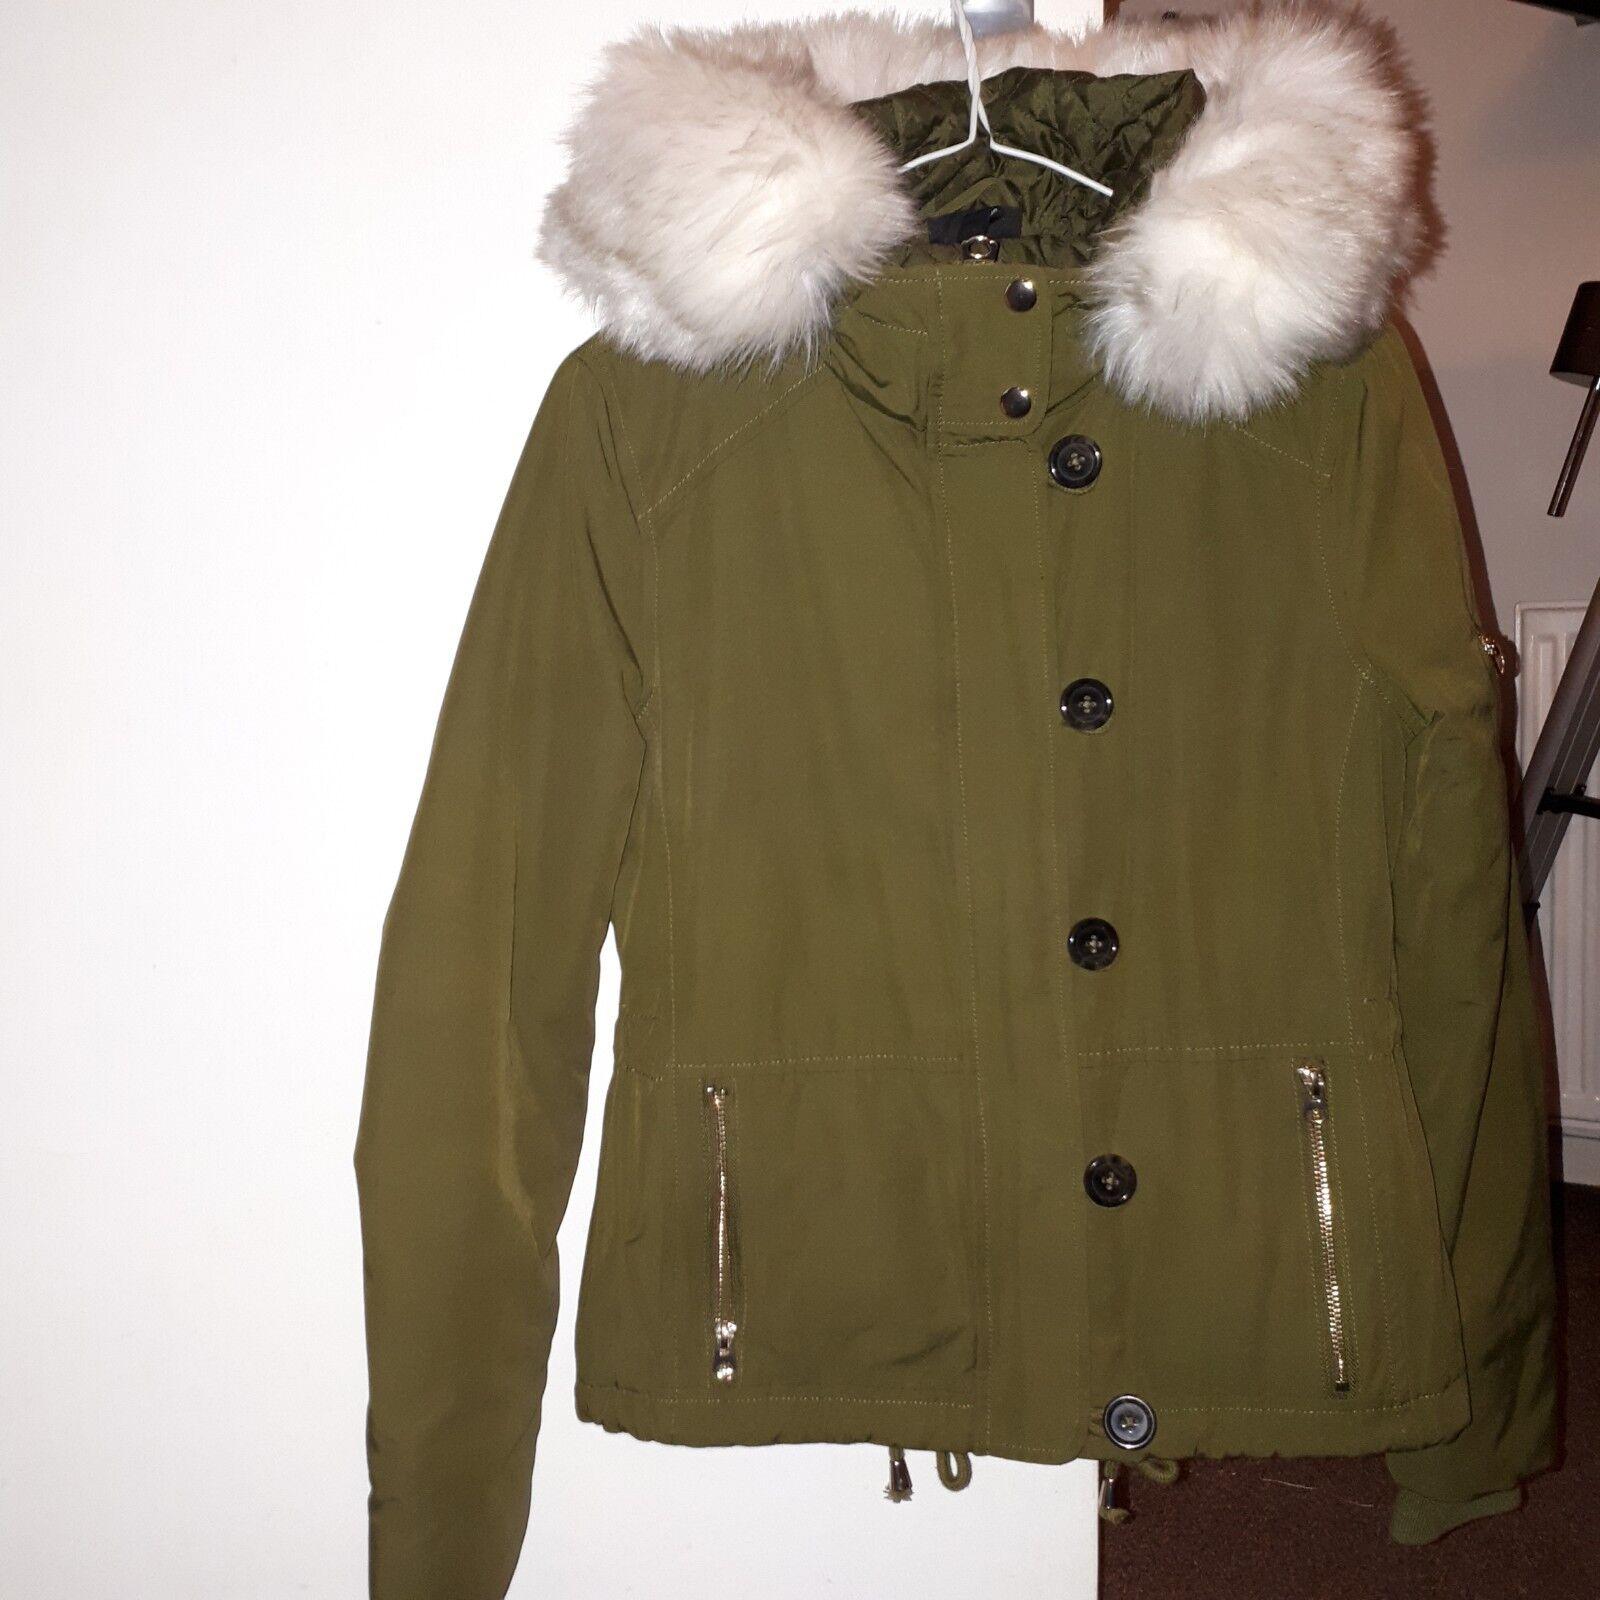 Topshop size 4 khaki green parka coat bomber fur hood, mint, great condition